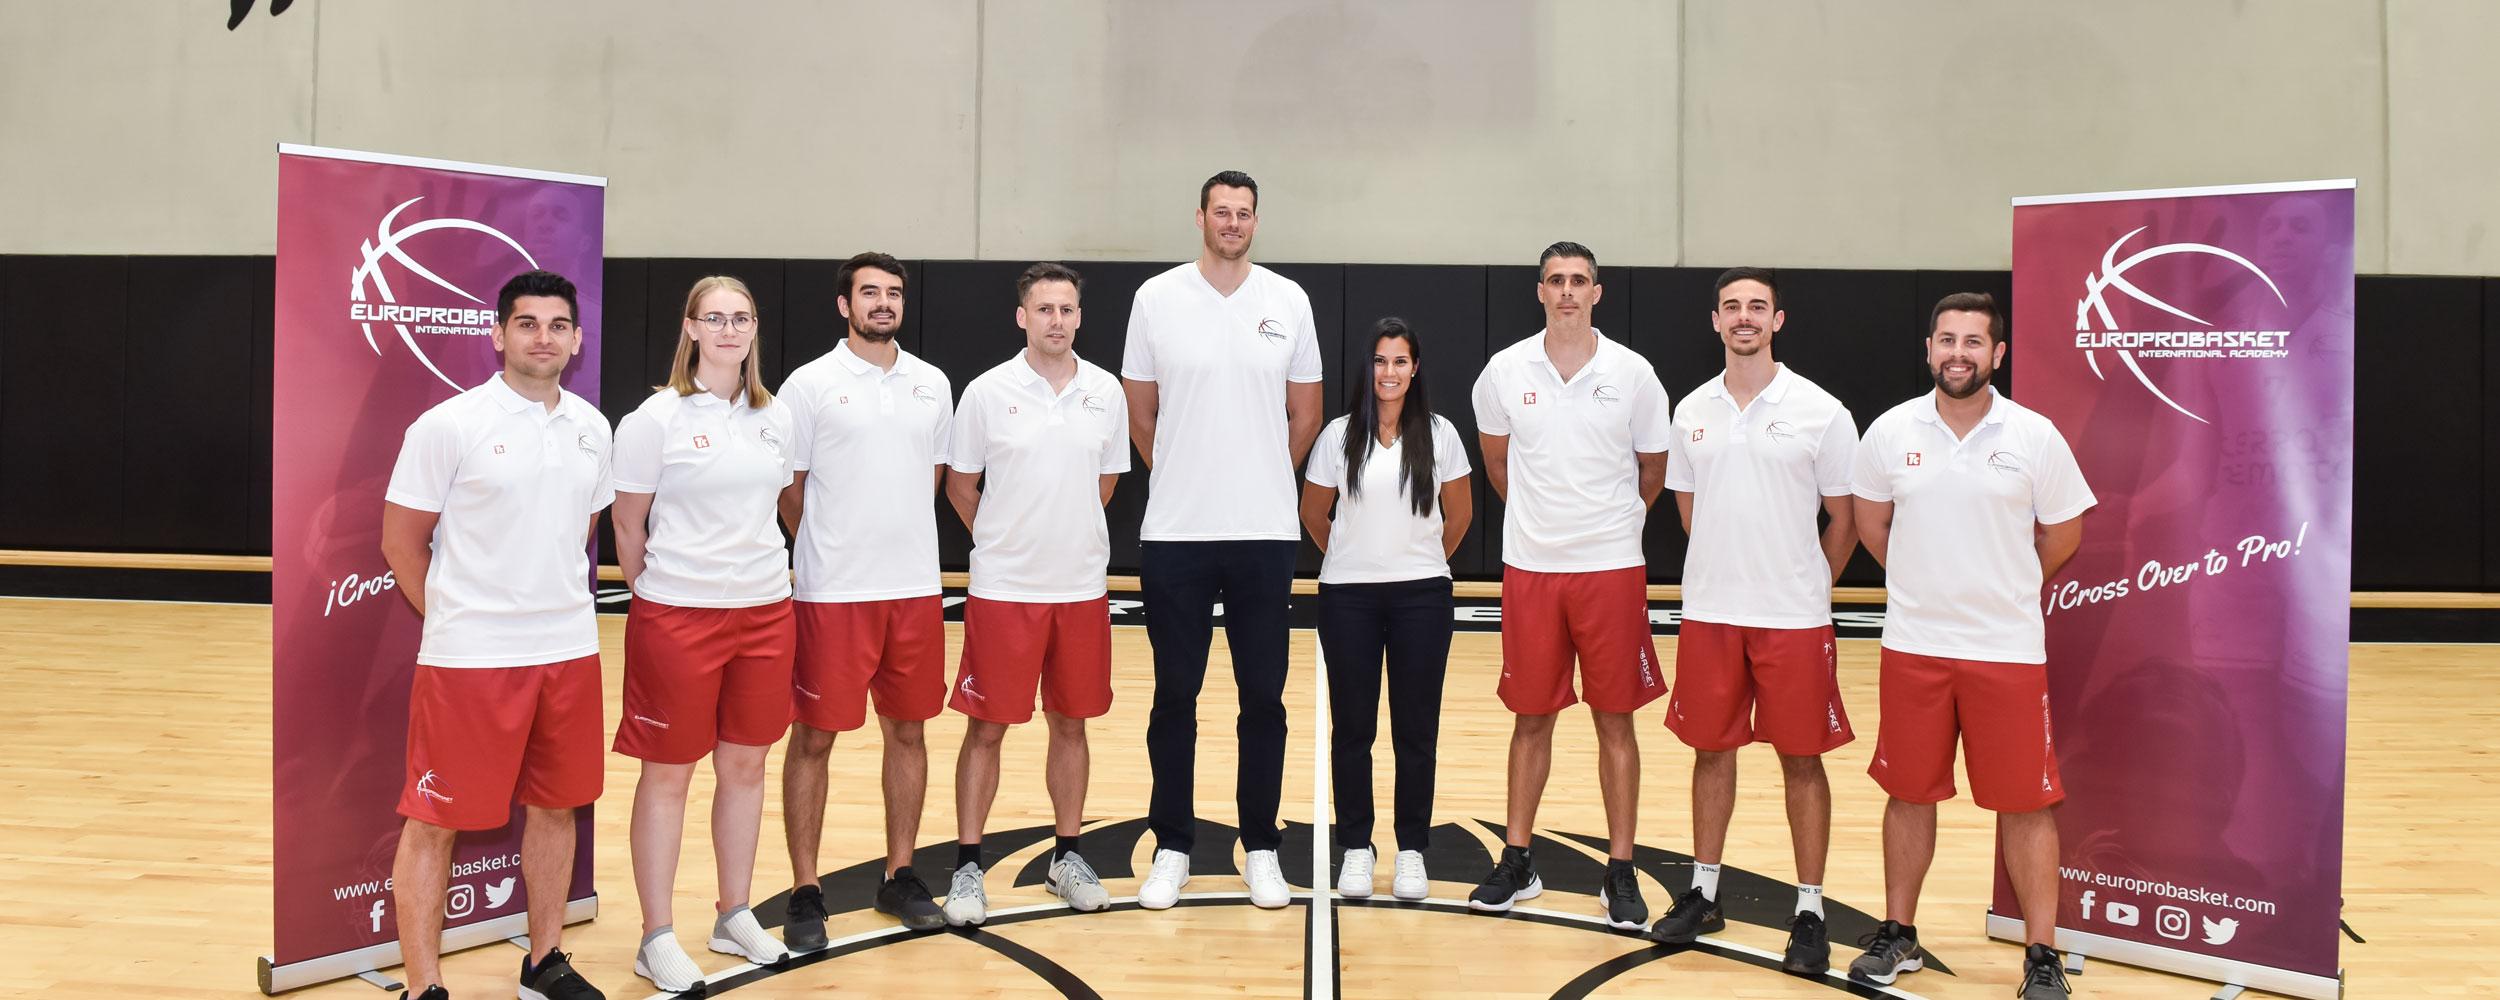 Overseas Basketball Agents at Europrobasket